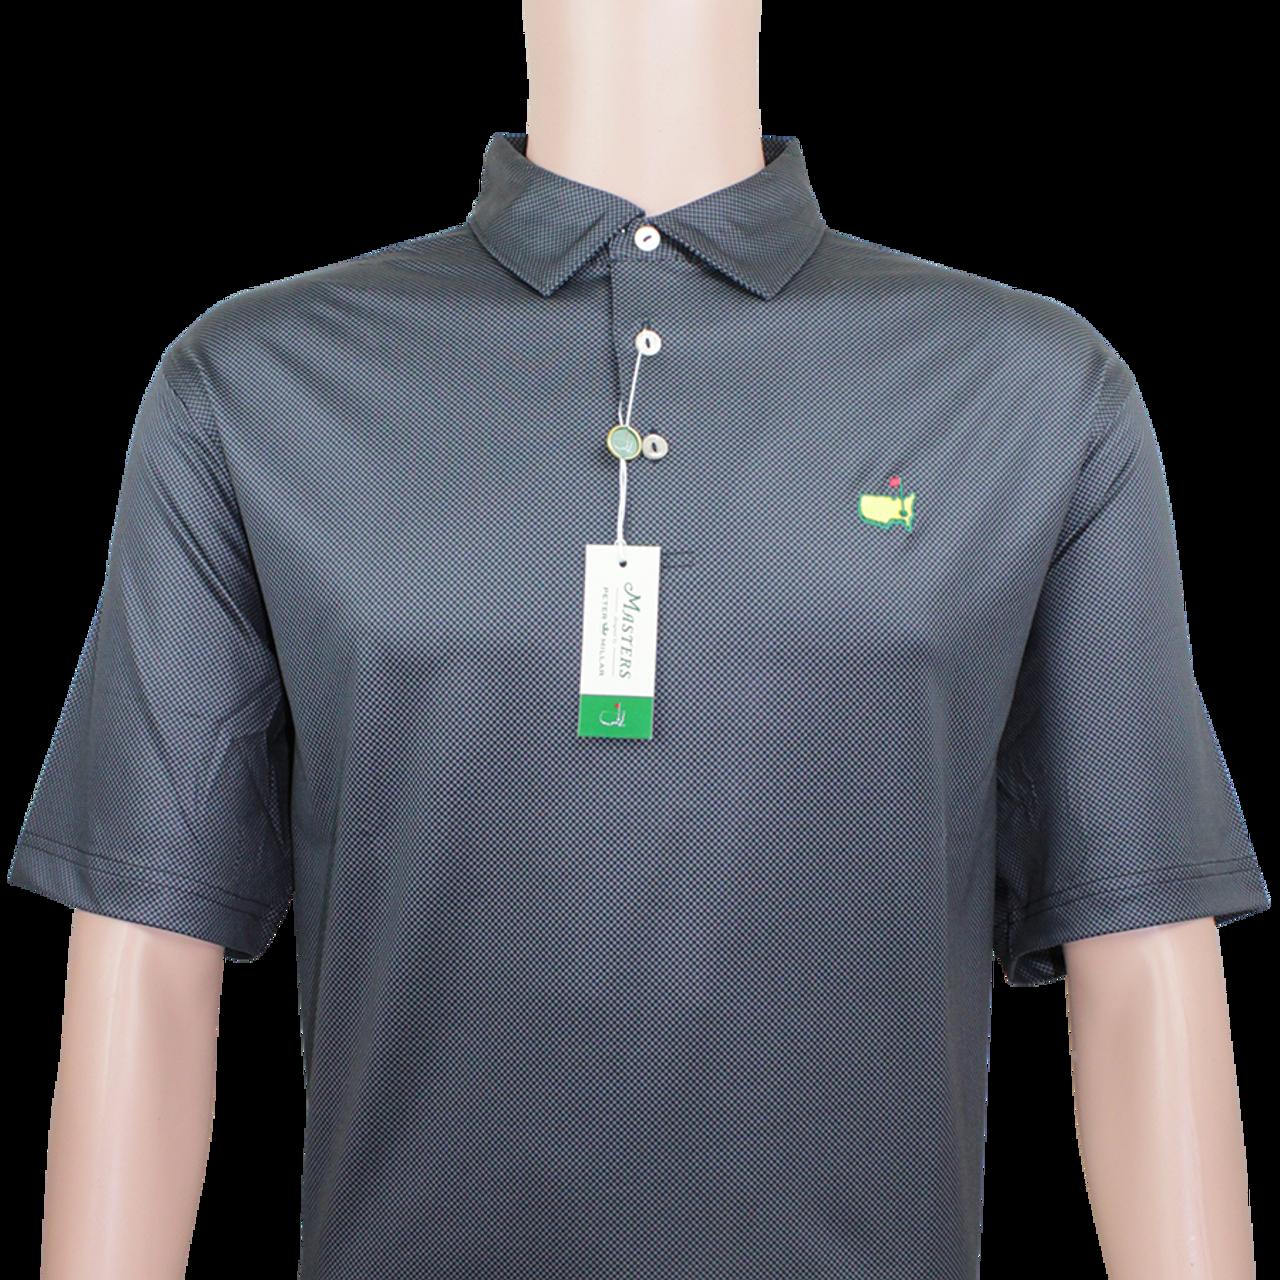 cacd05777d7 Masters Black   Charcoal Checkered Peter Millar Performance Tech Golf Shirt